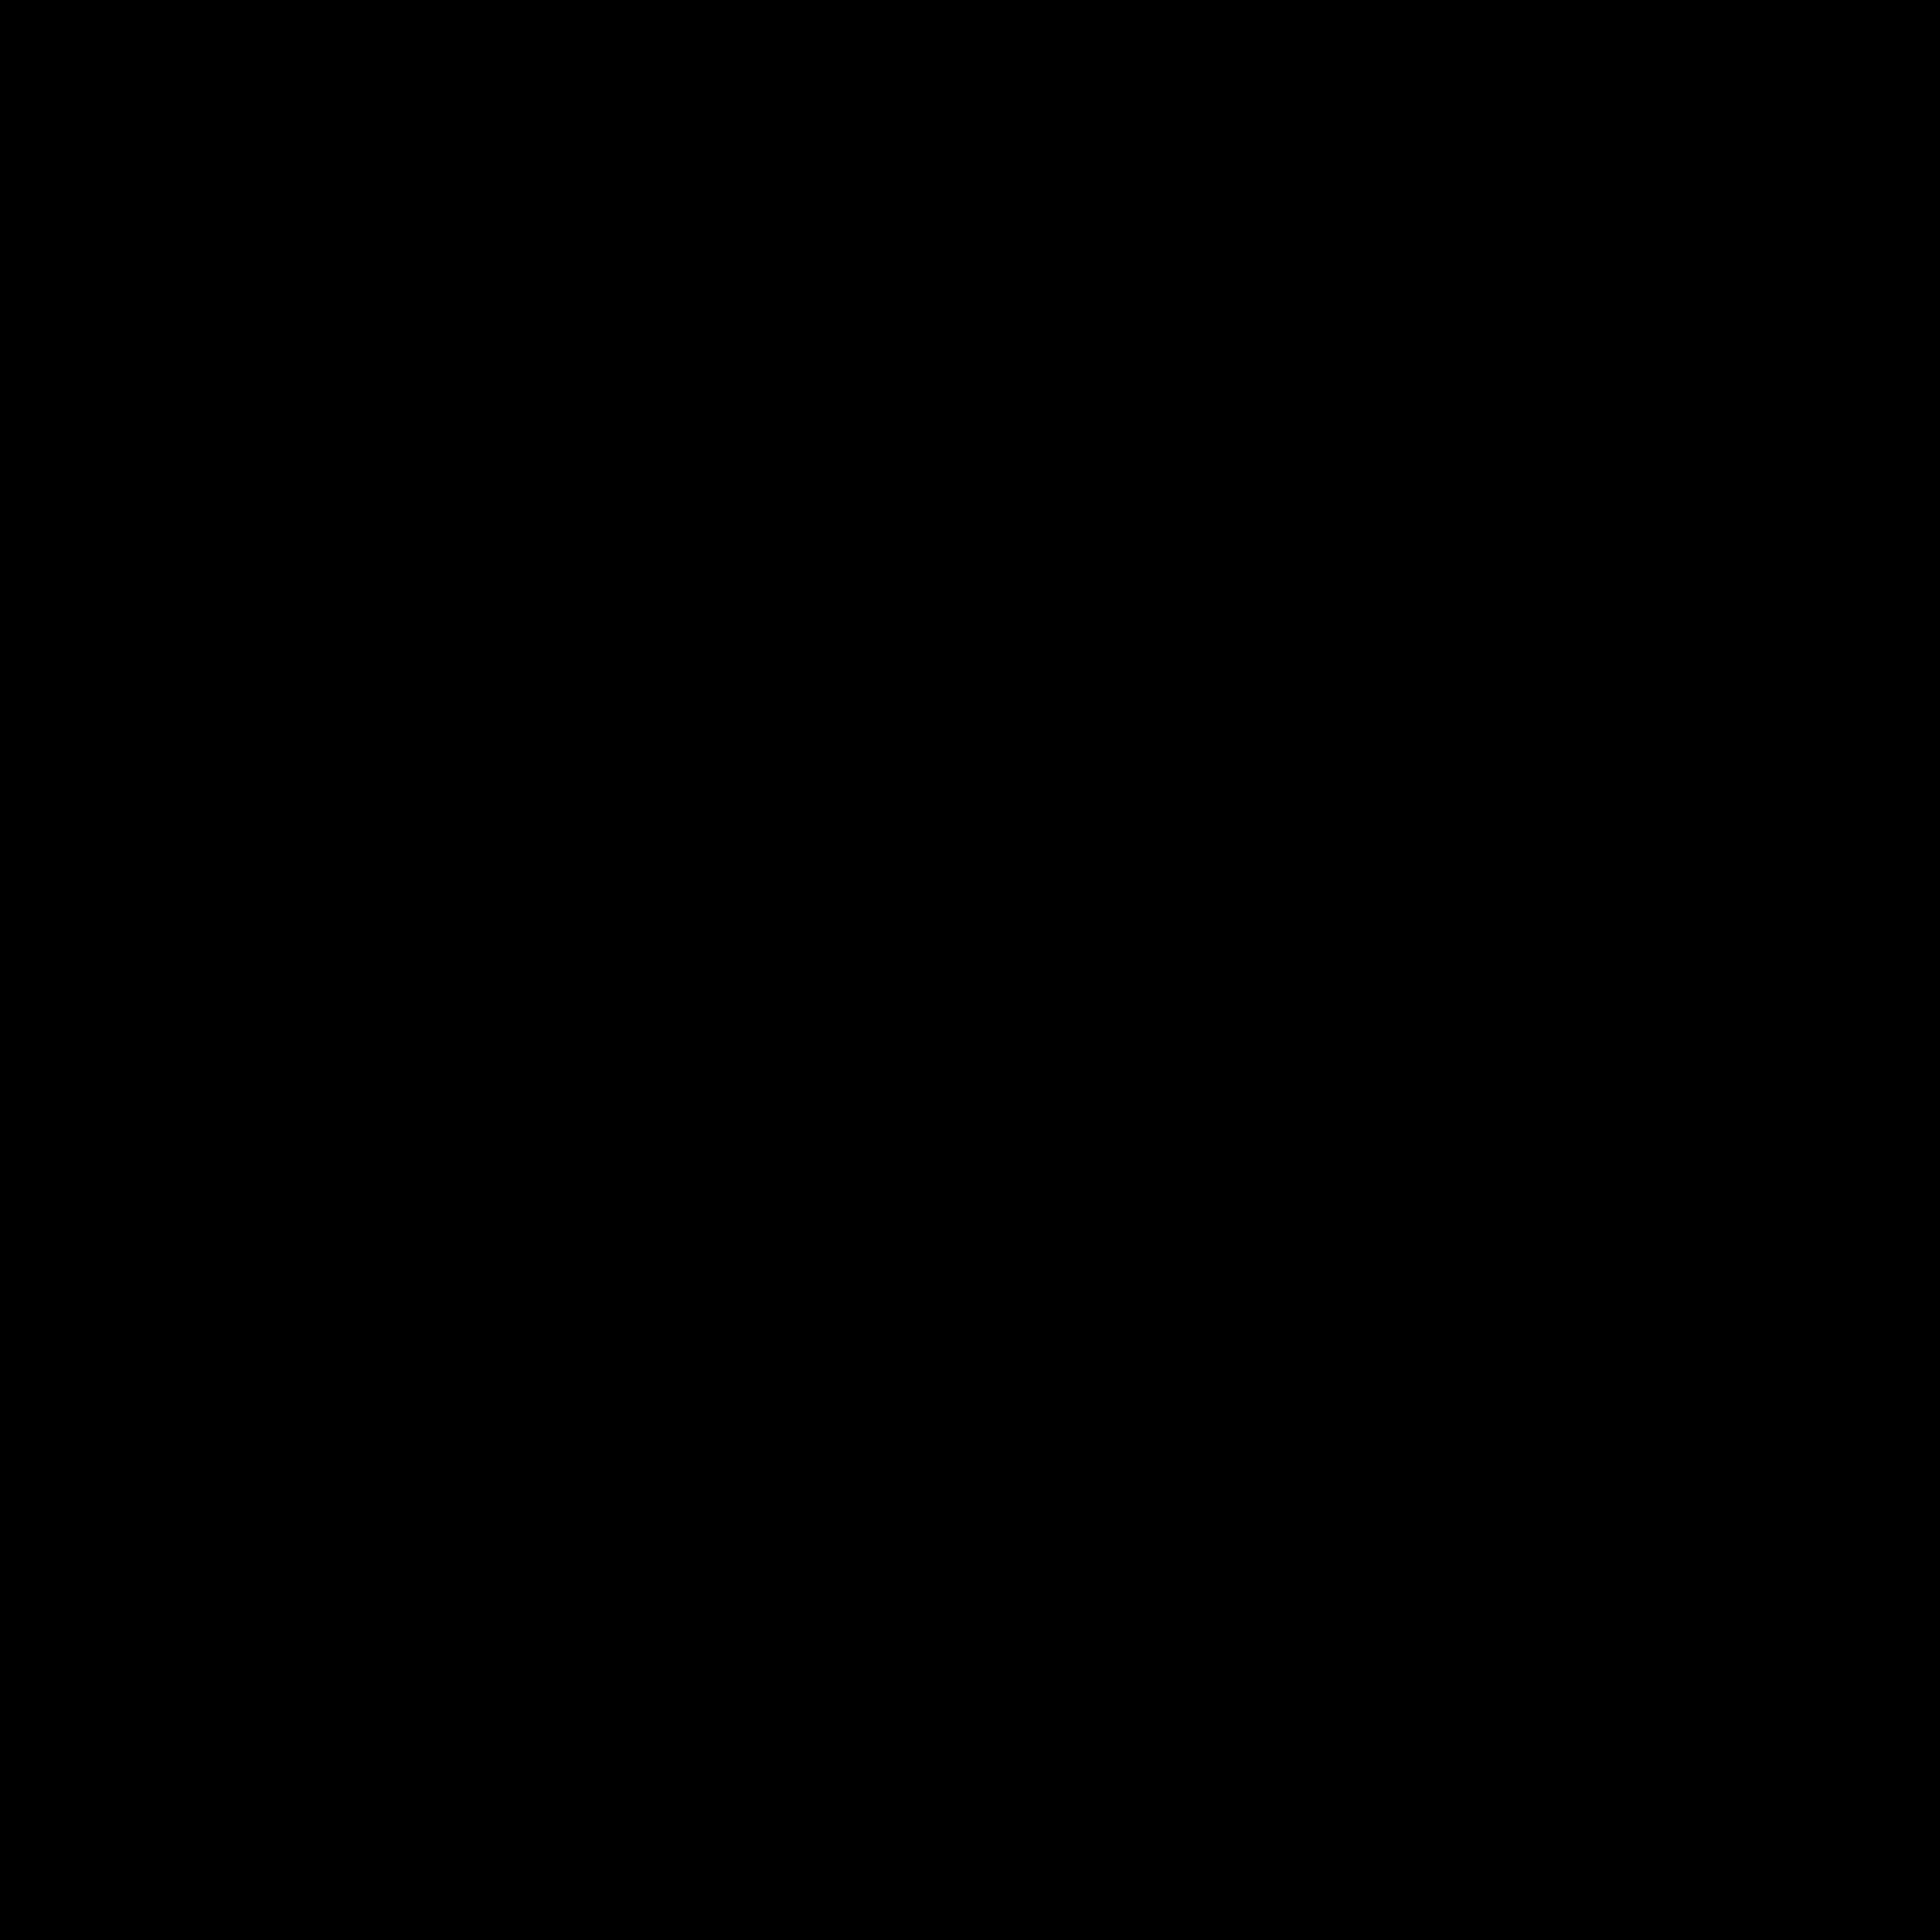 Nike Swoosh Logo Png Transparent Svg Vector Freebie Supply Nike Logo Nike Swoosh Logo Nike Logo Vector